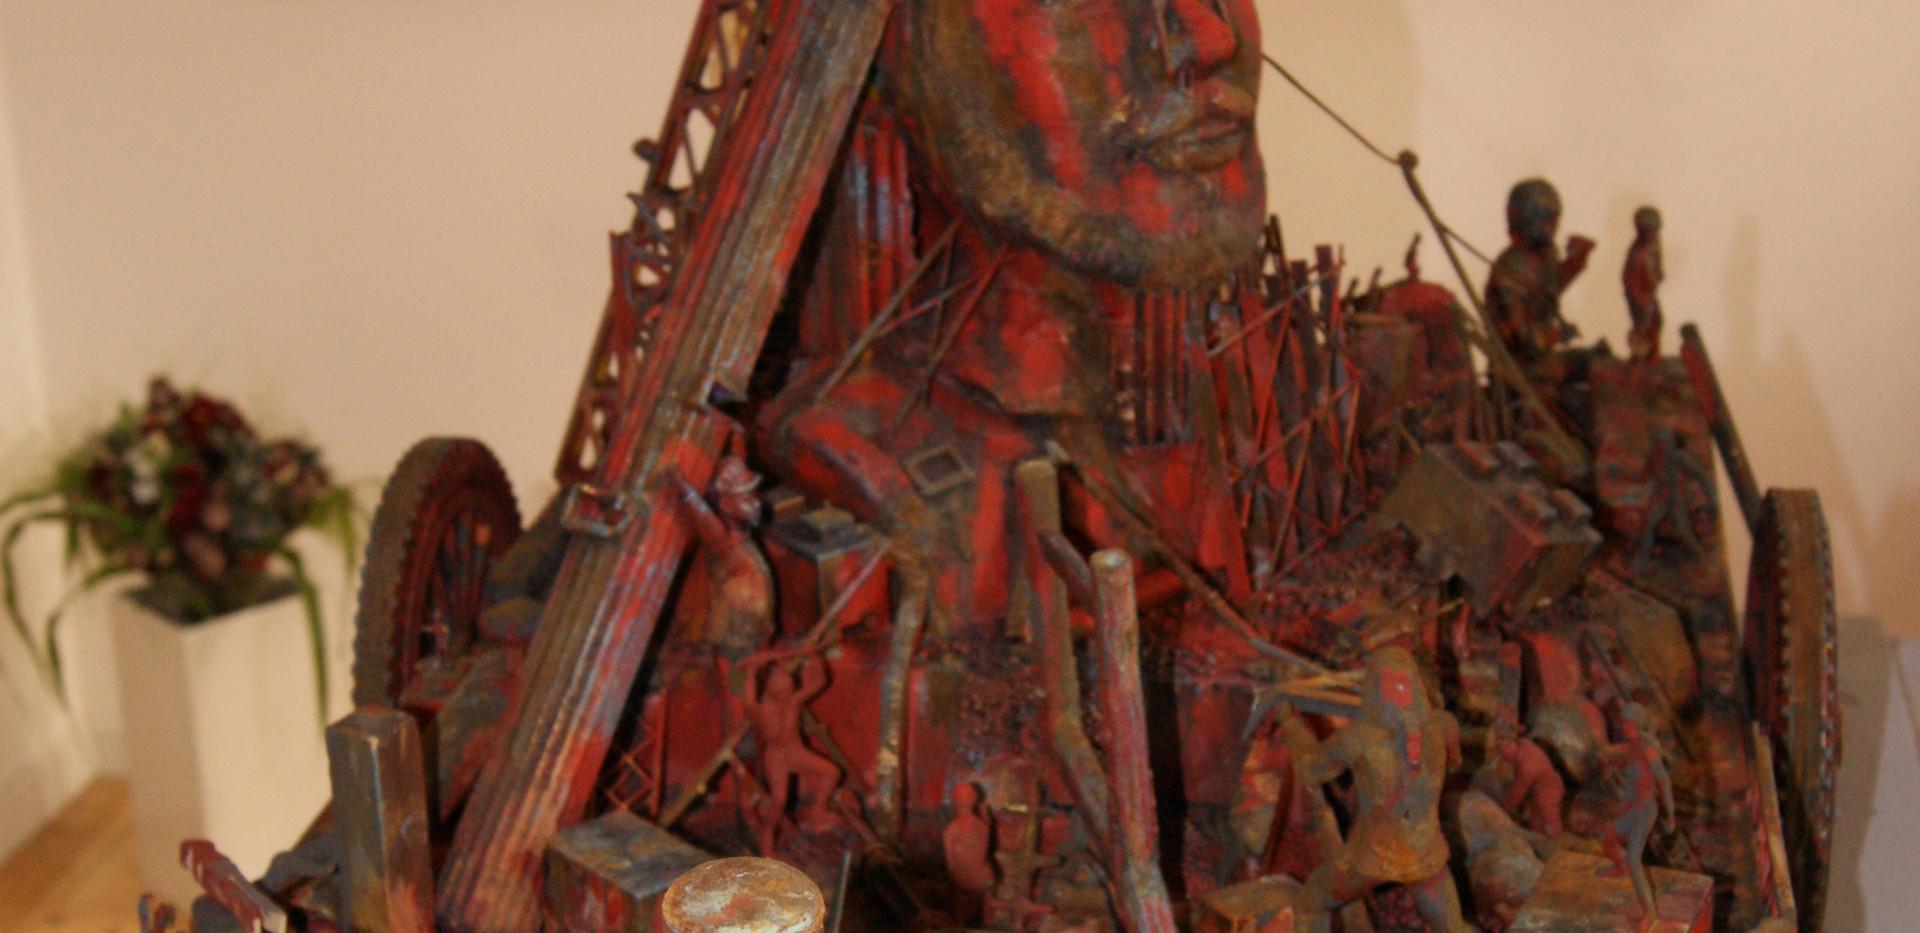 Friedrich engels and Marx sculpture